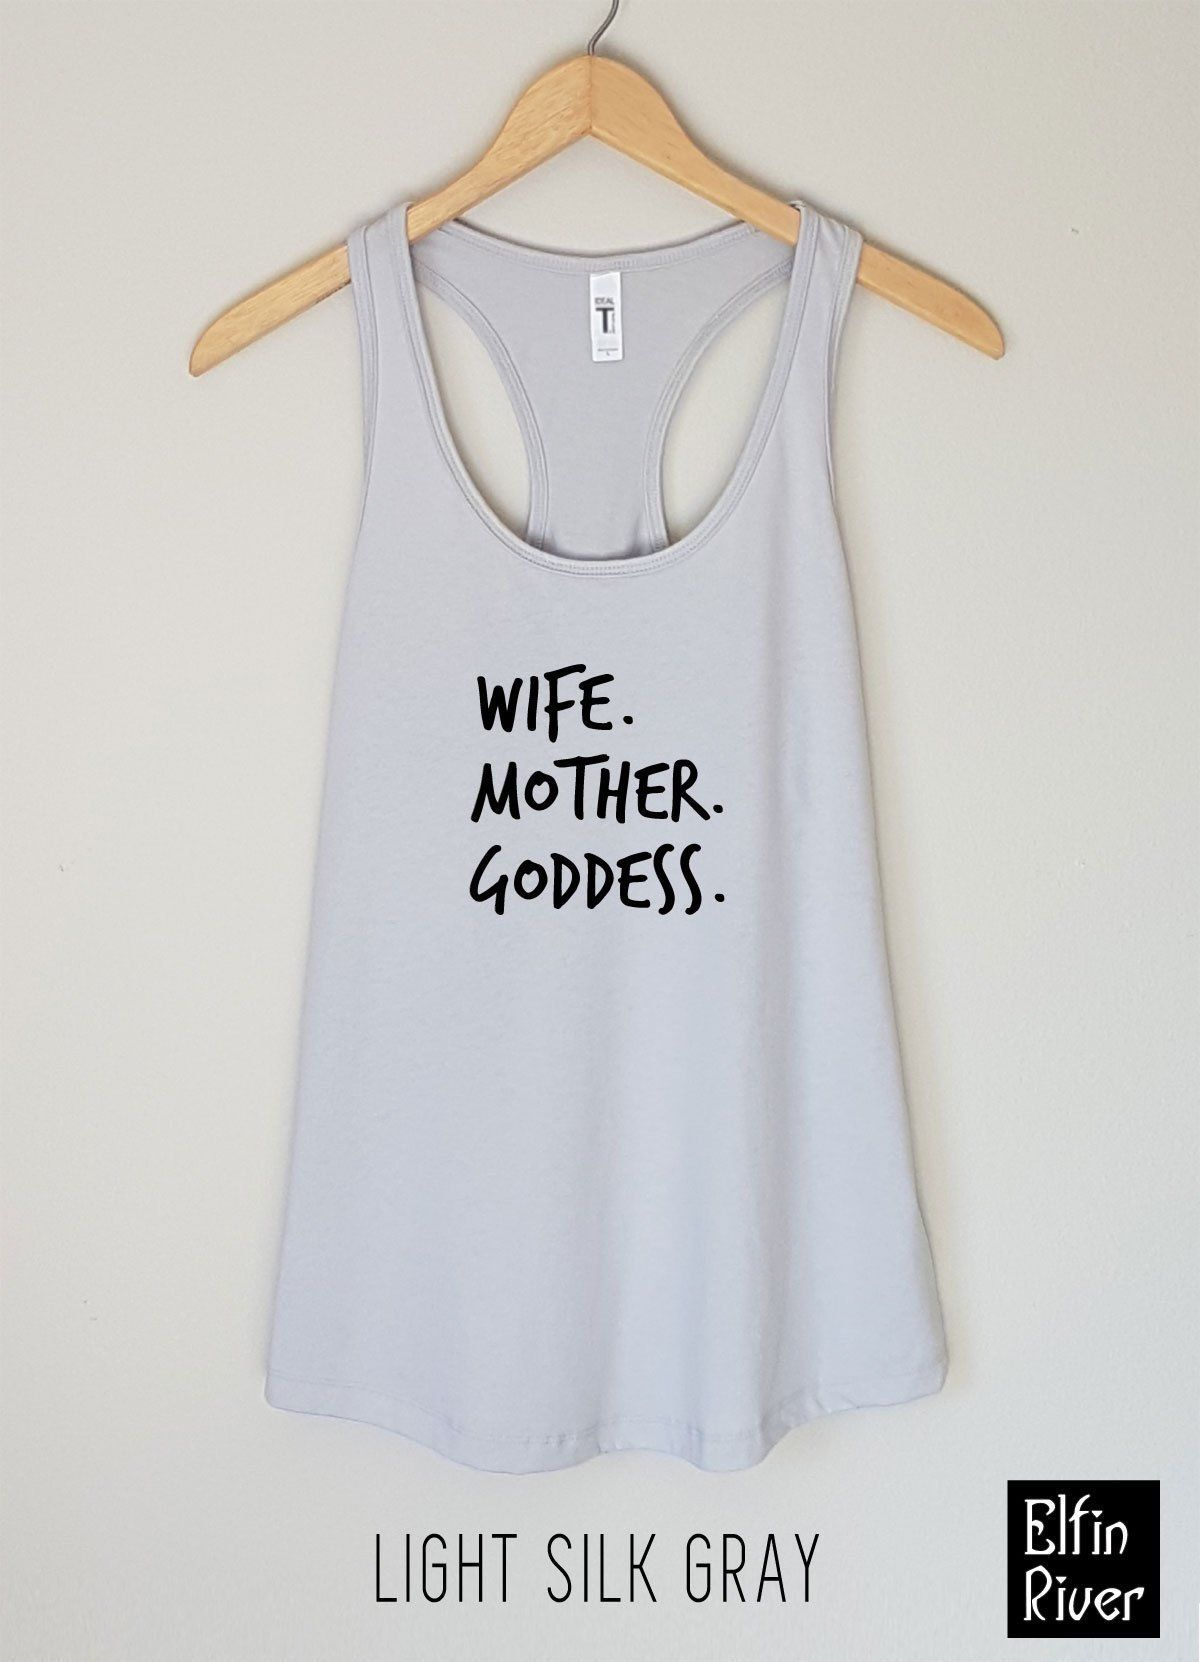 Wife Mother Goddess Shirt Mrs Funny T